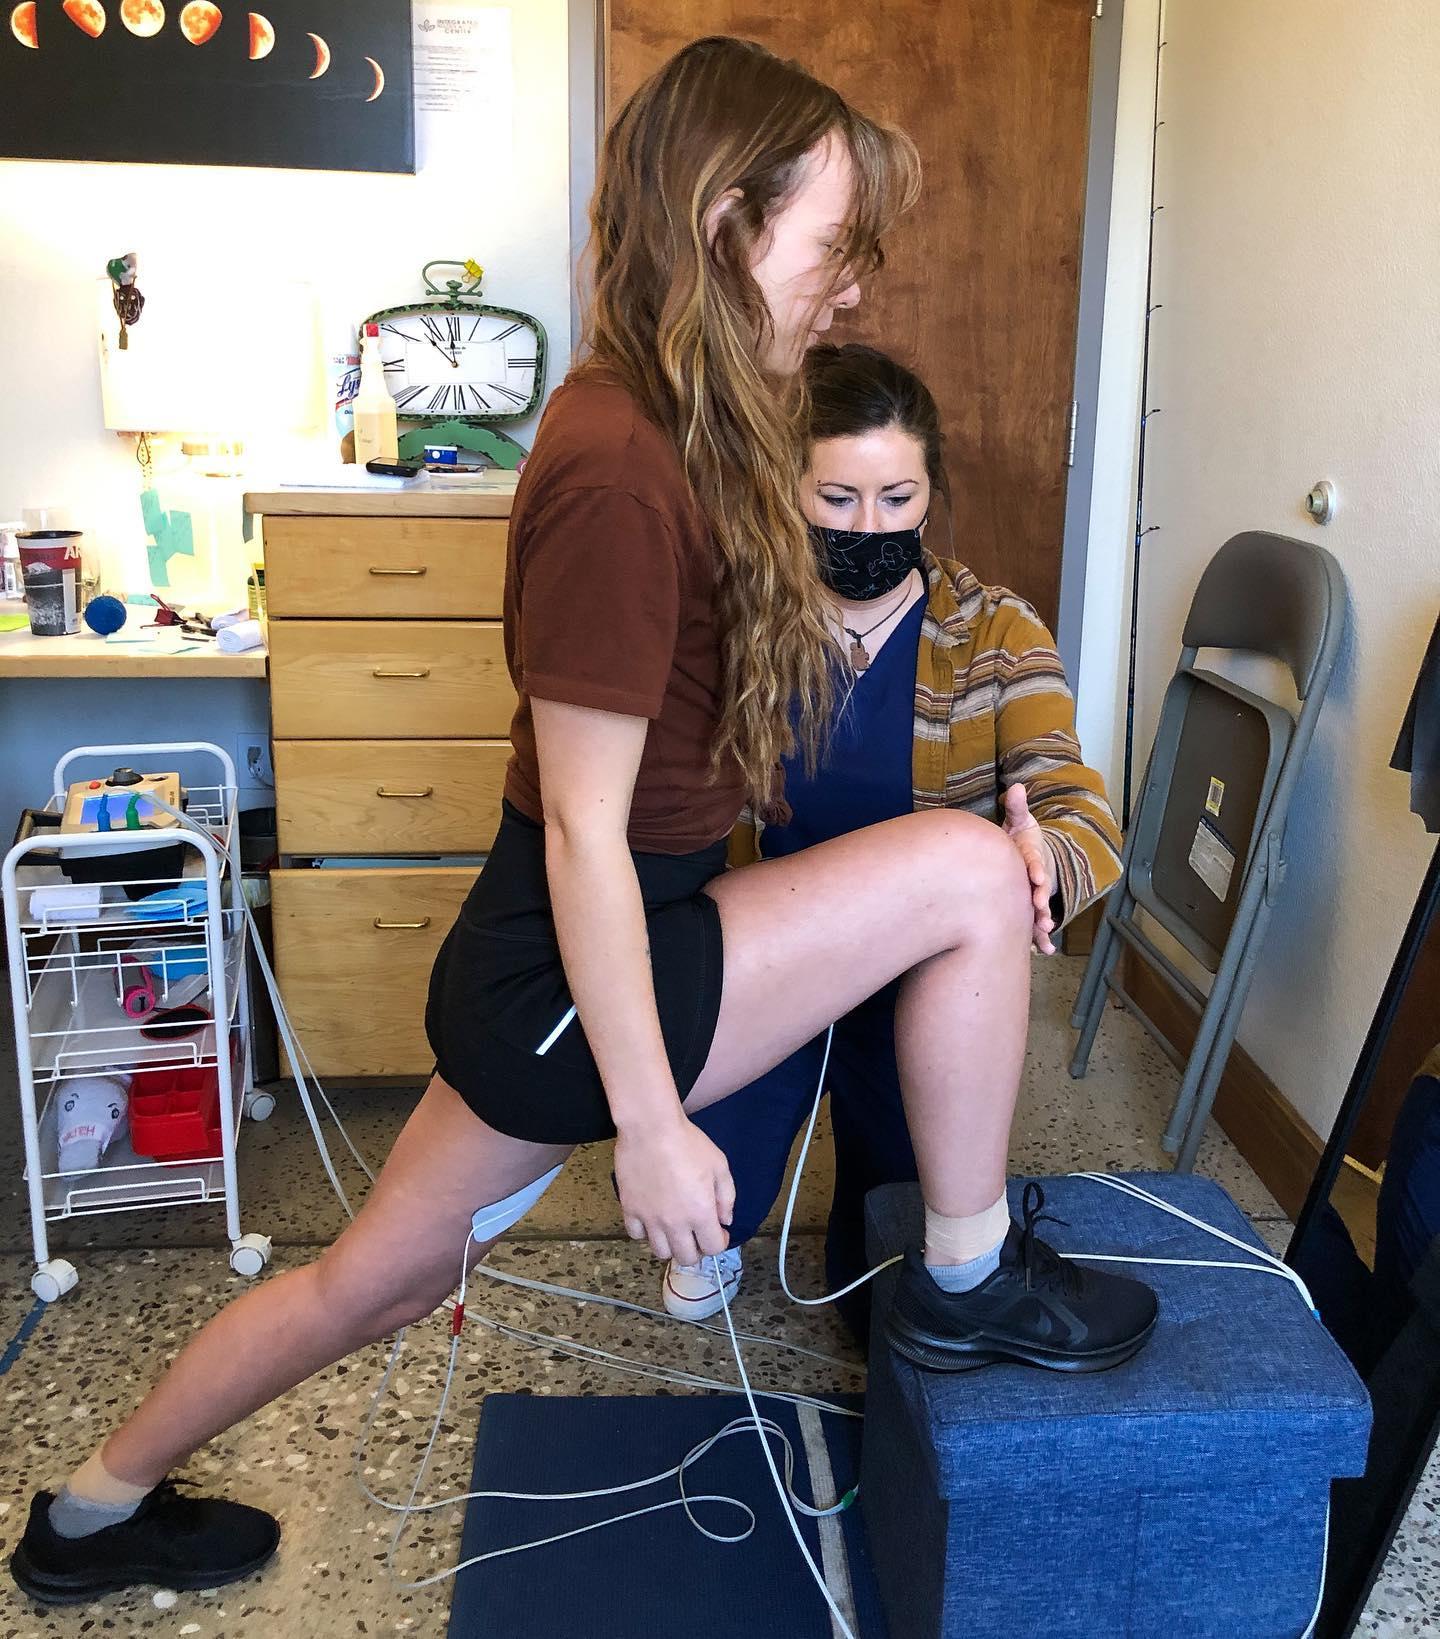 Woman doing rehabilitating exercises